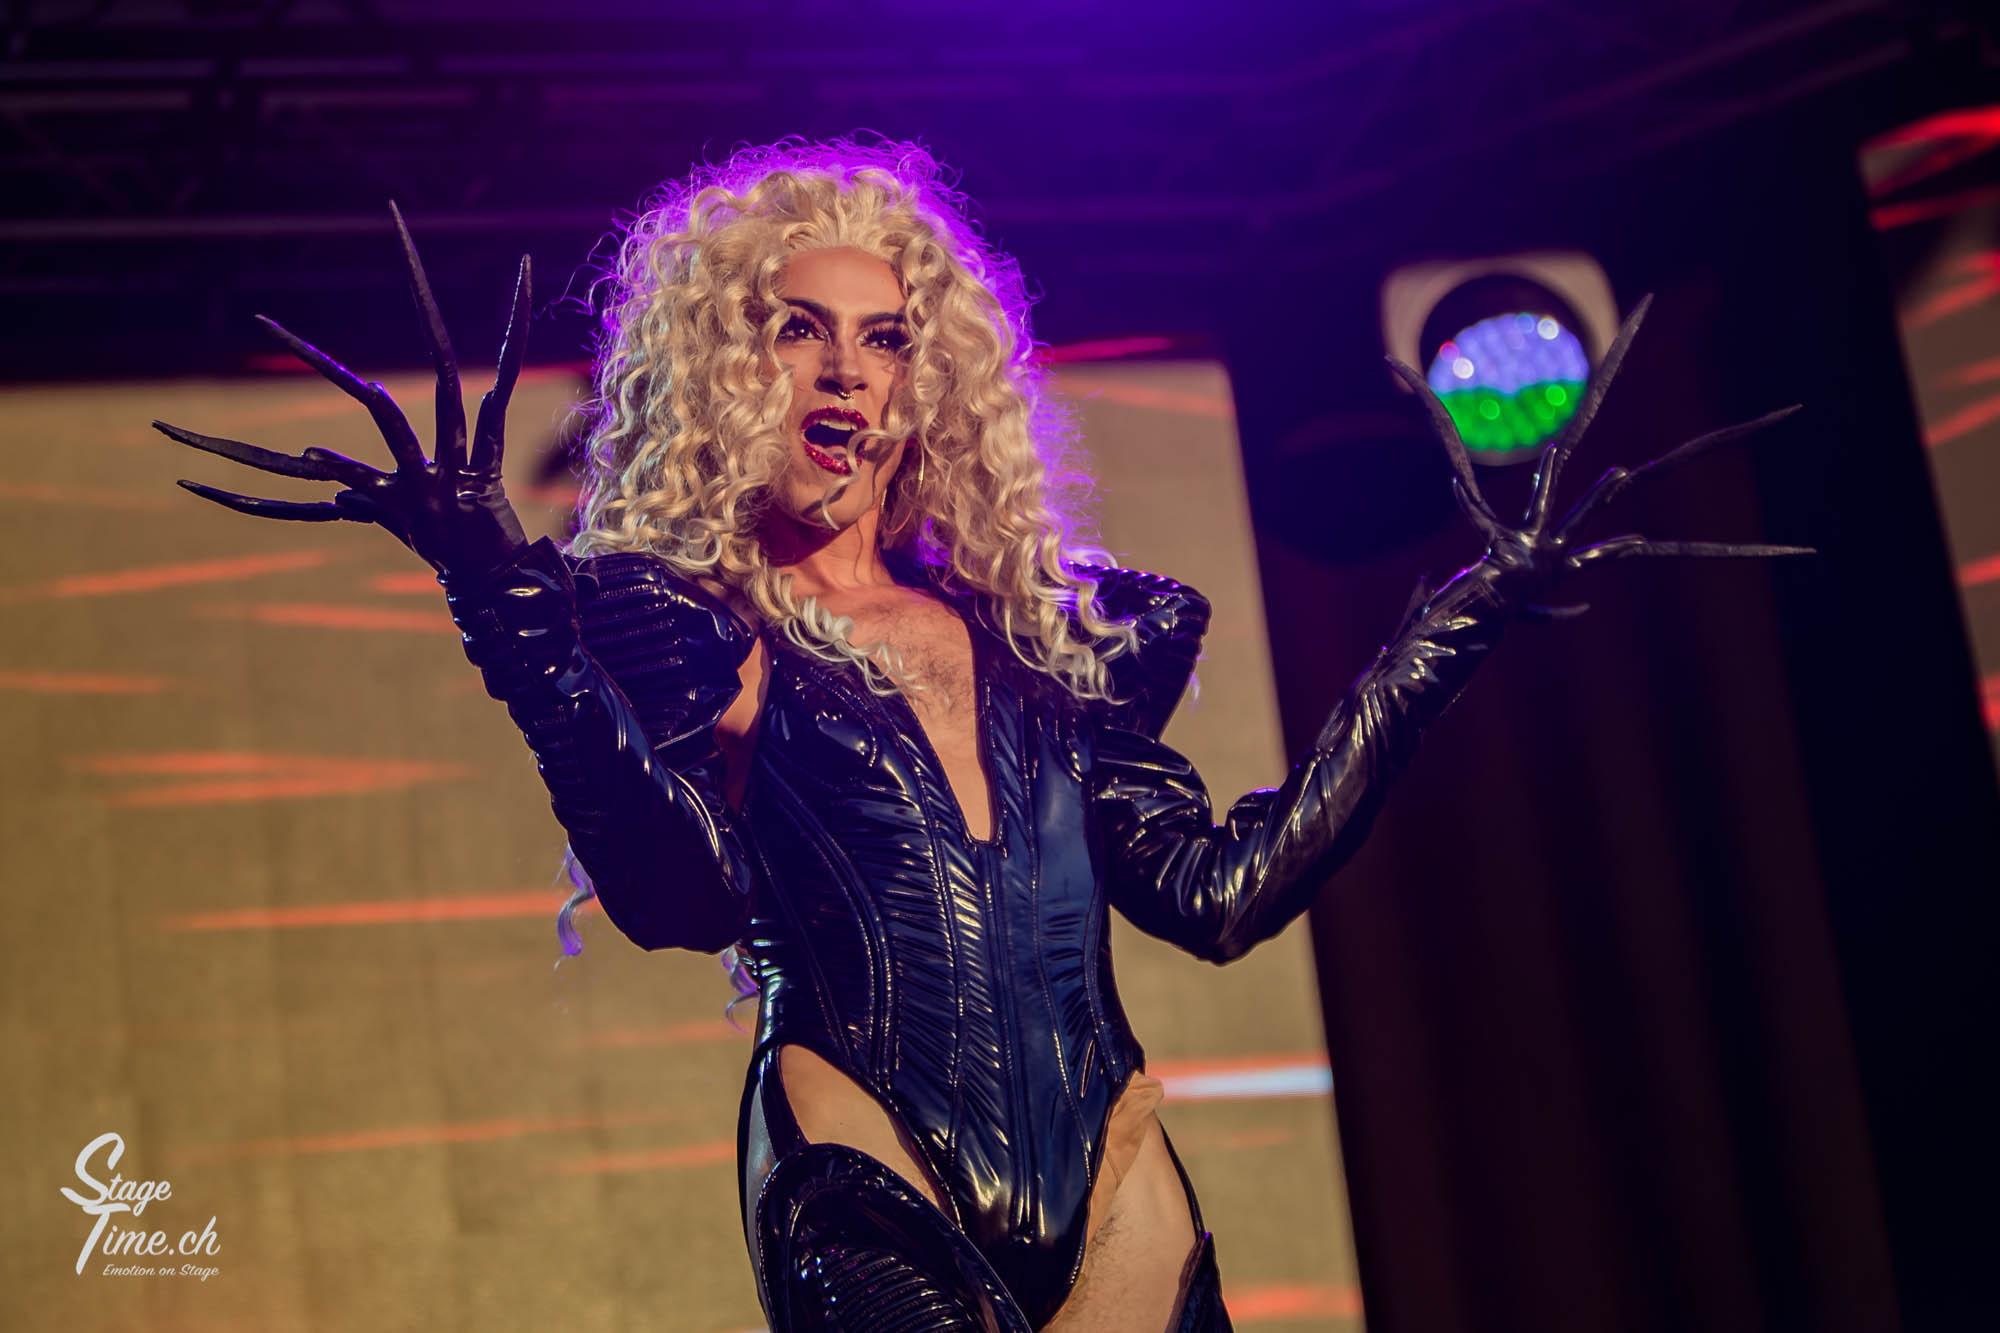 Zurich_Pride_Festival_2018___📷_Christoph_Gurtner___stagetime.ch-19